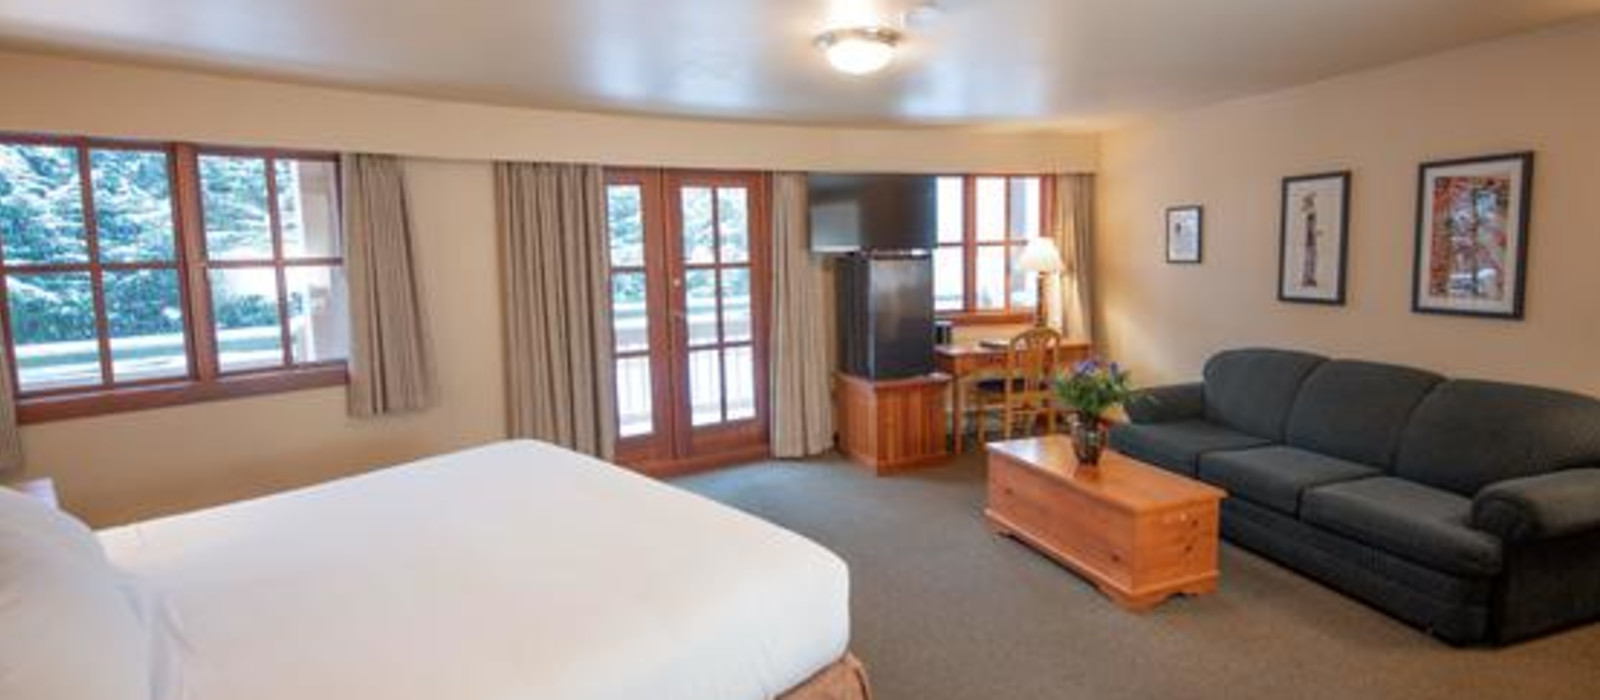 Hotel Painter's Lodge %region%